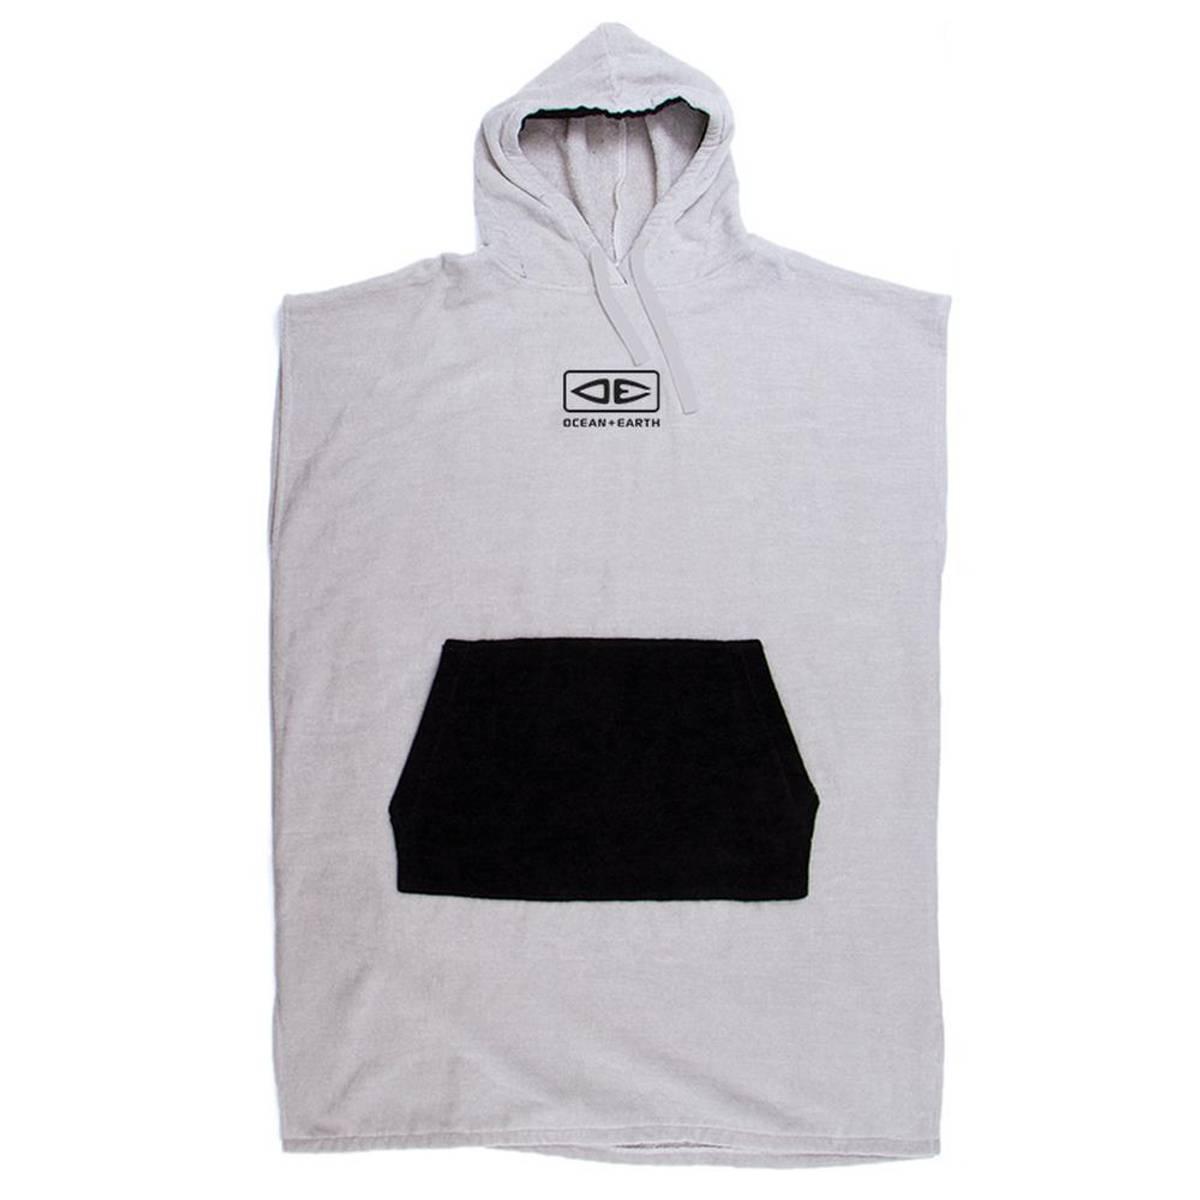 O & E - Hooded Poncho Day Break - Light Grey/Black